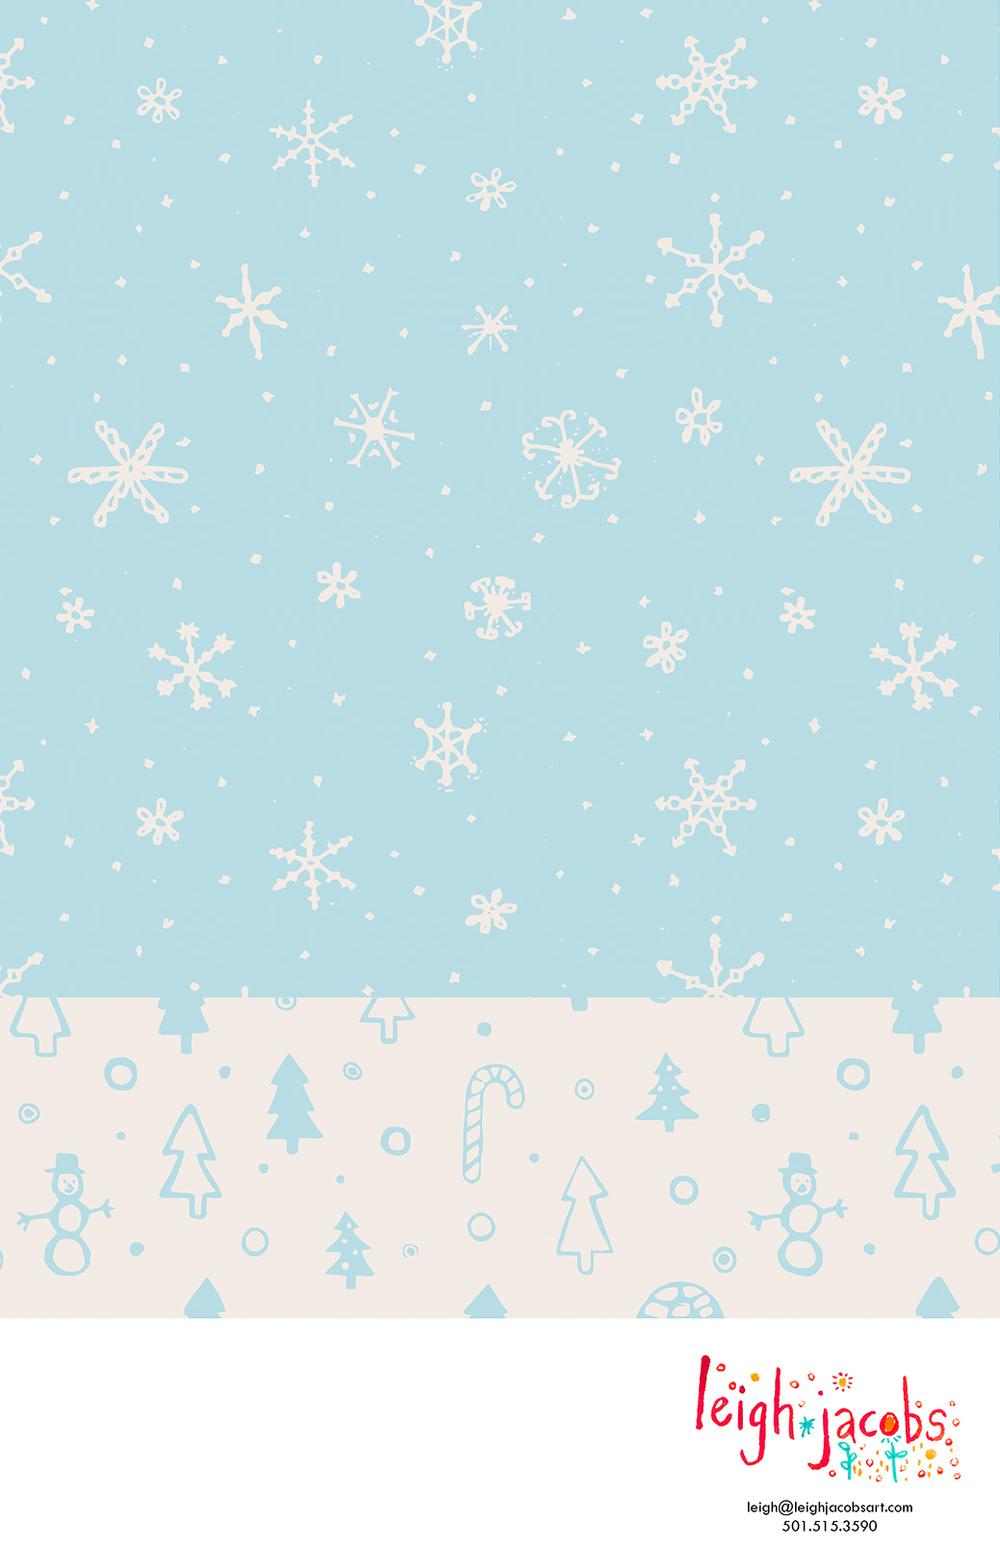 leighjacobs_snowflake_web.jpg